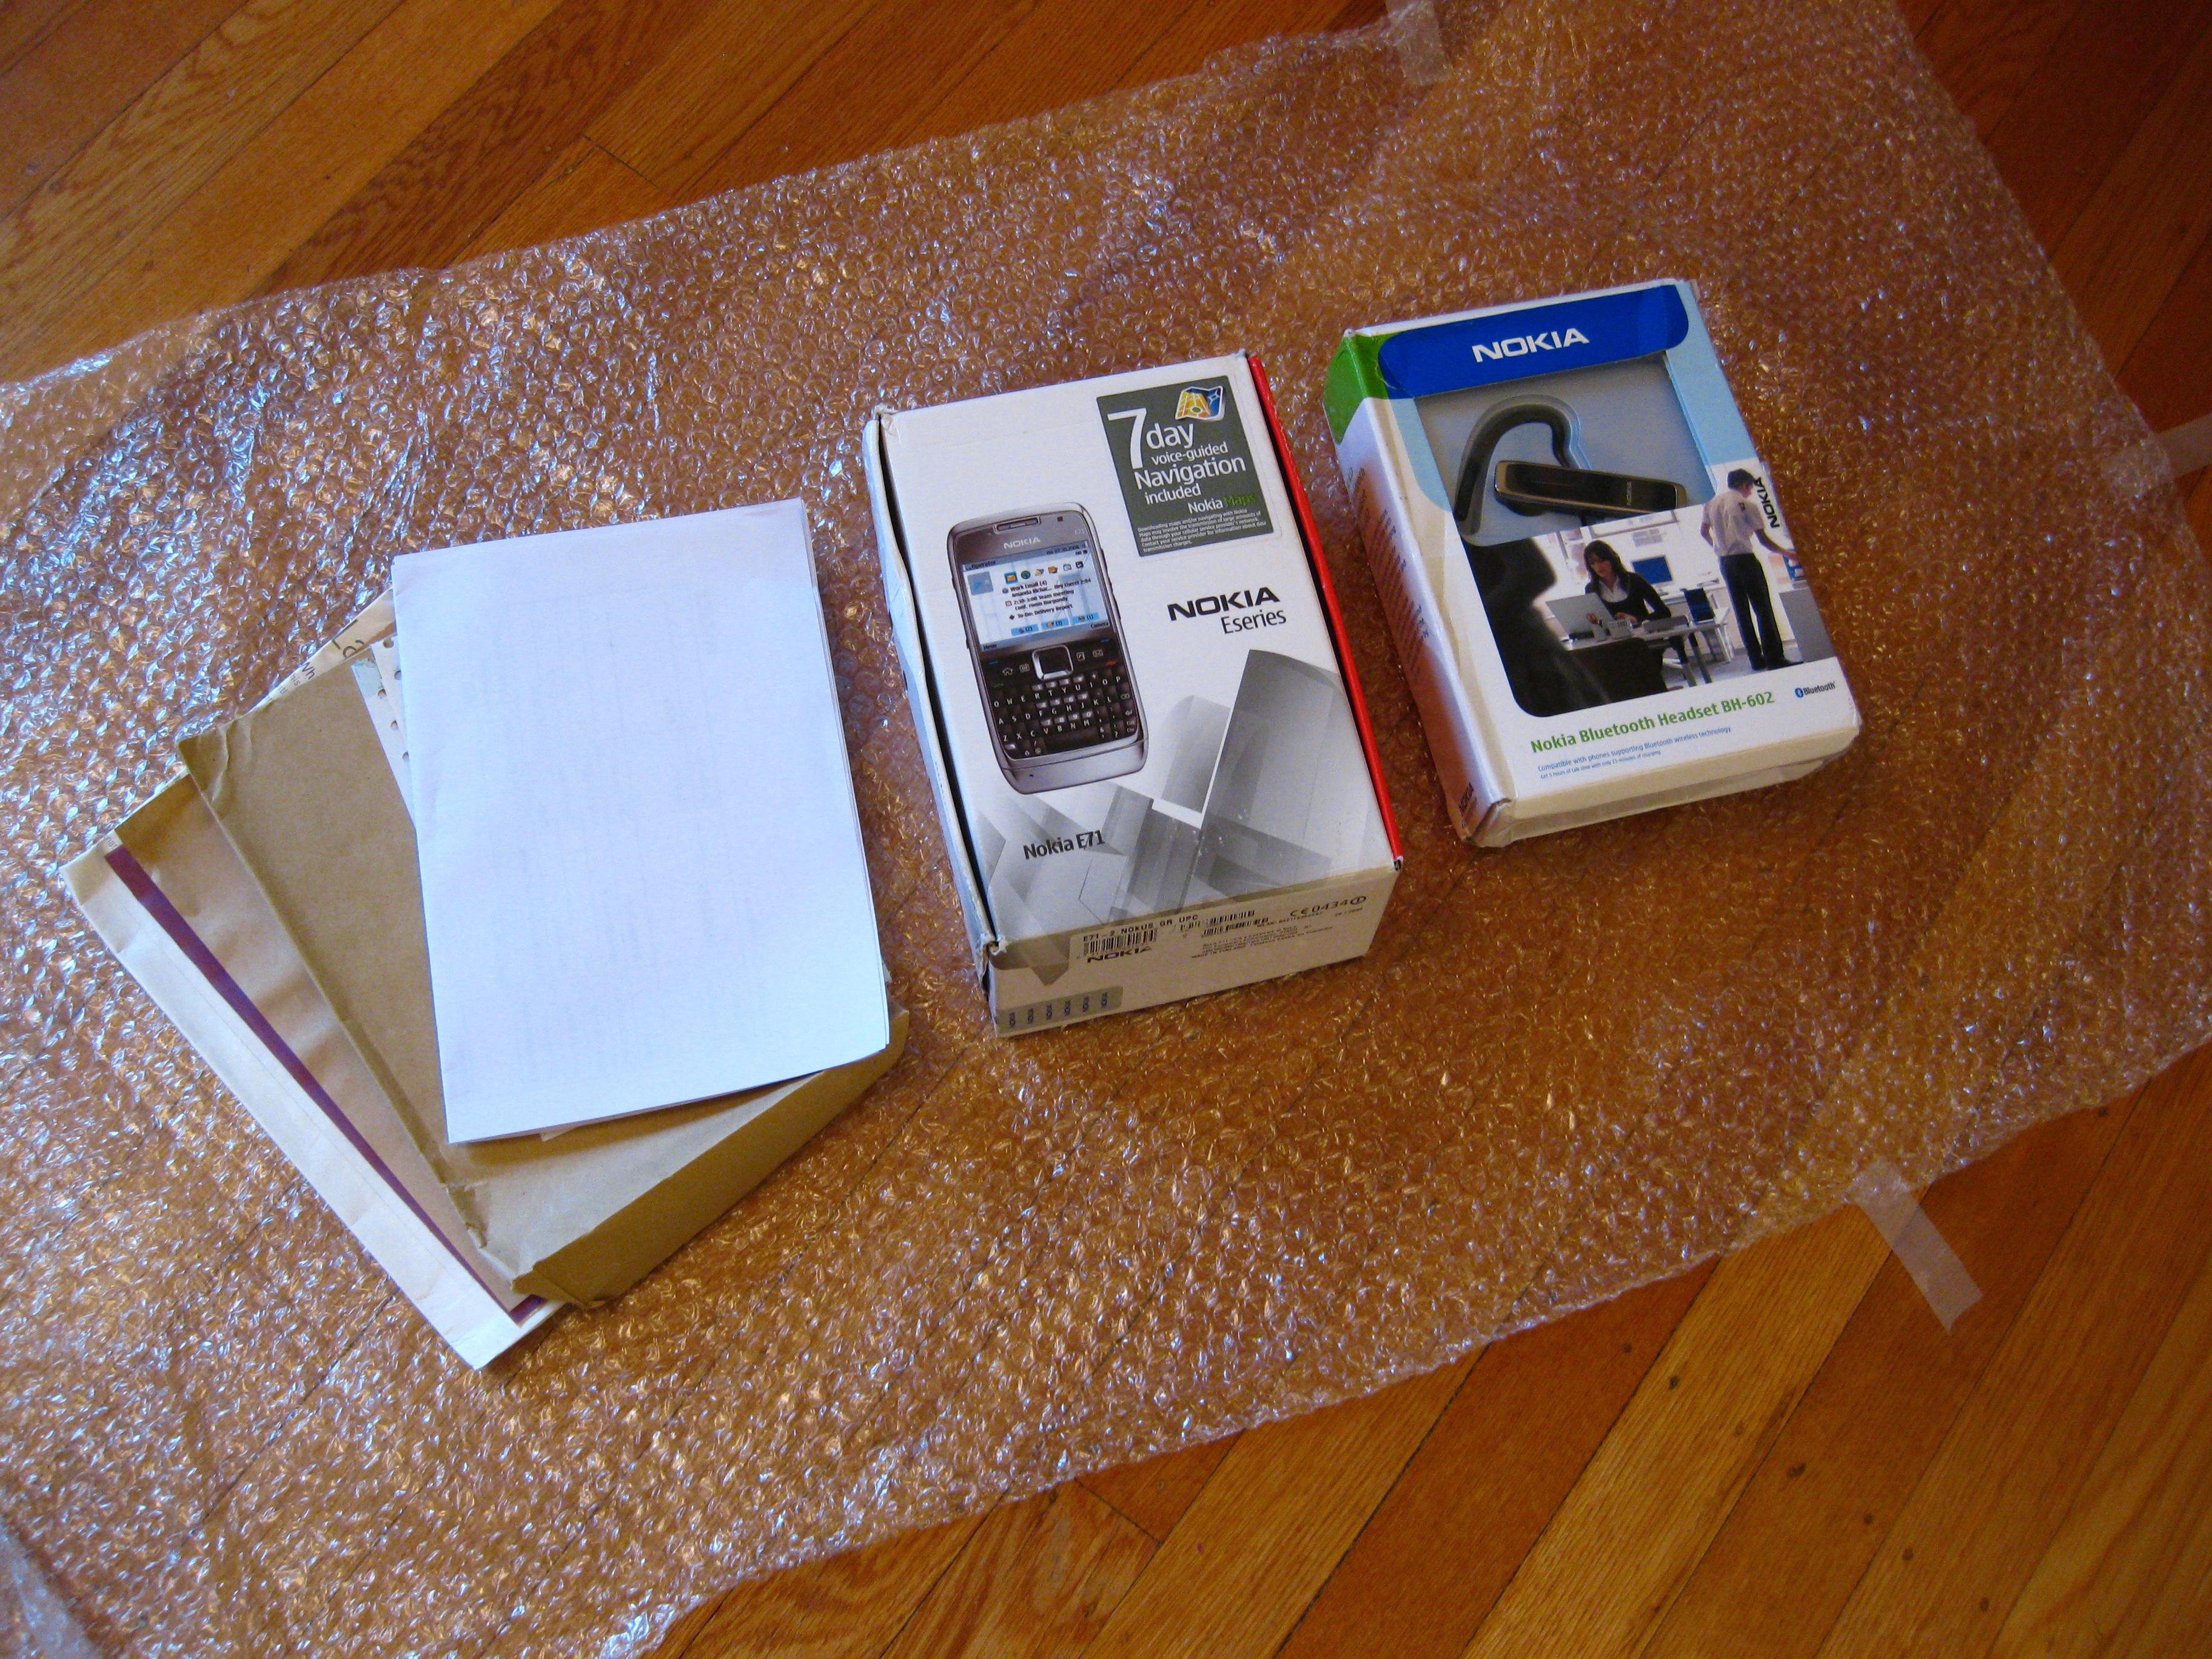 Unboxing Nokia E71